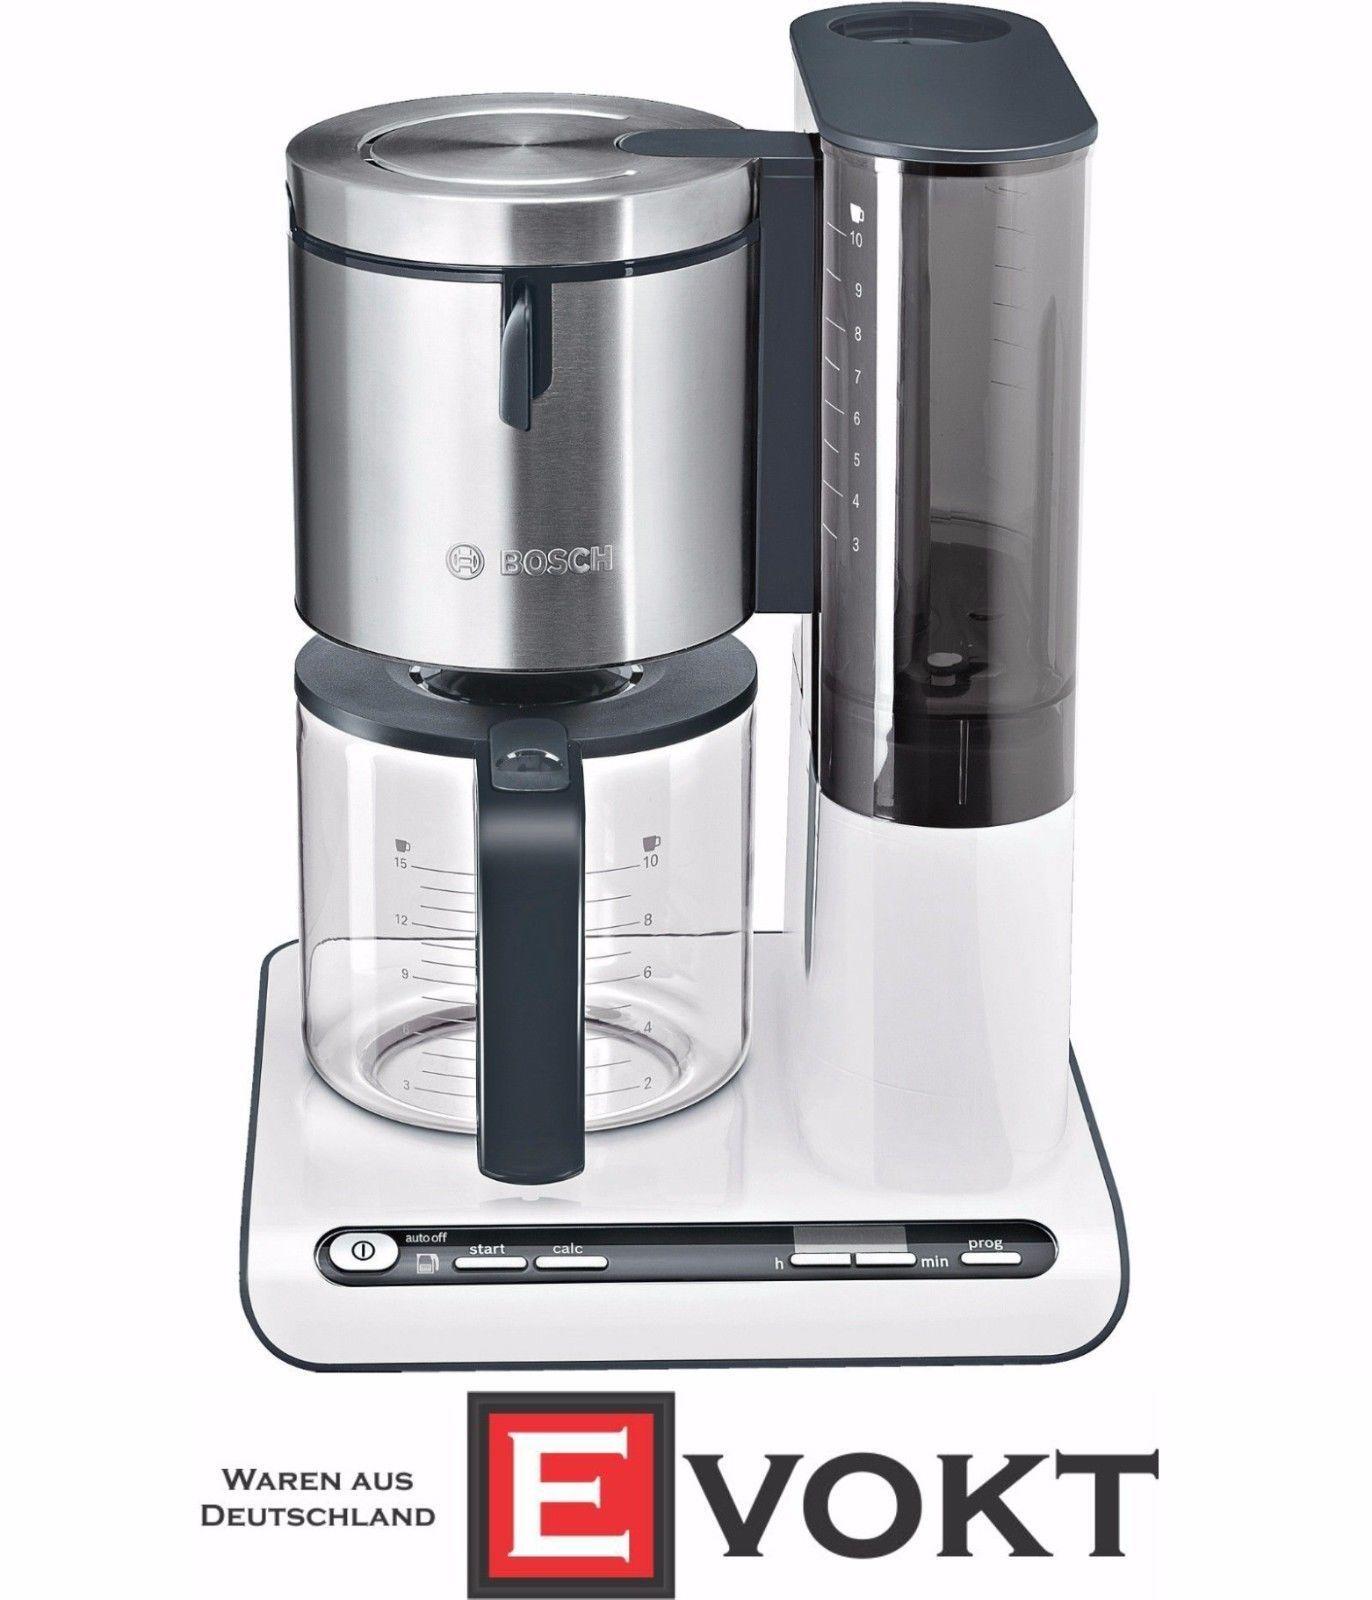 Bosch Tka8631 Filter Coffee Machine 10/15 Cups Glass Jug